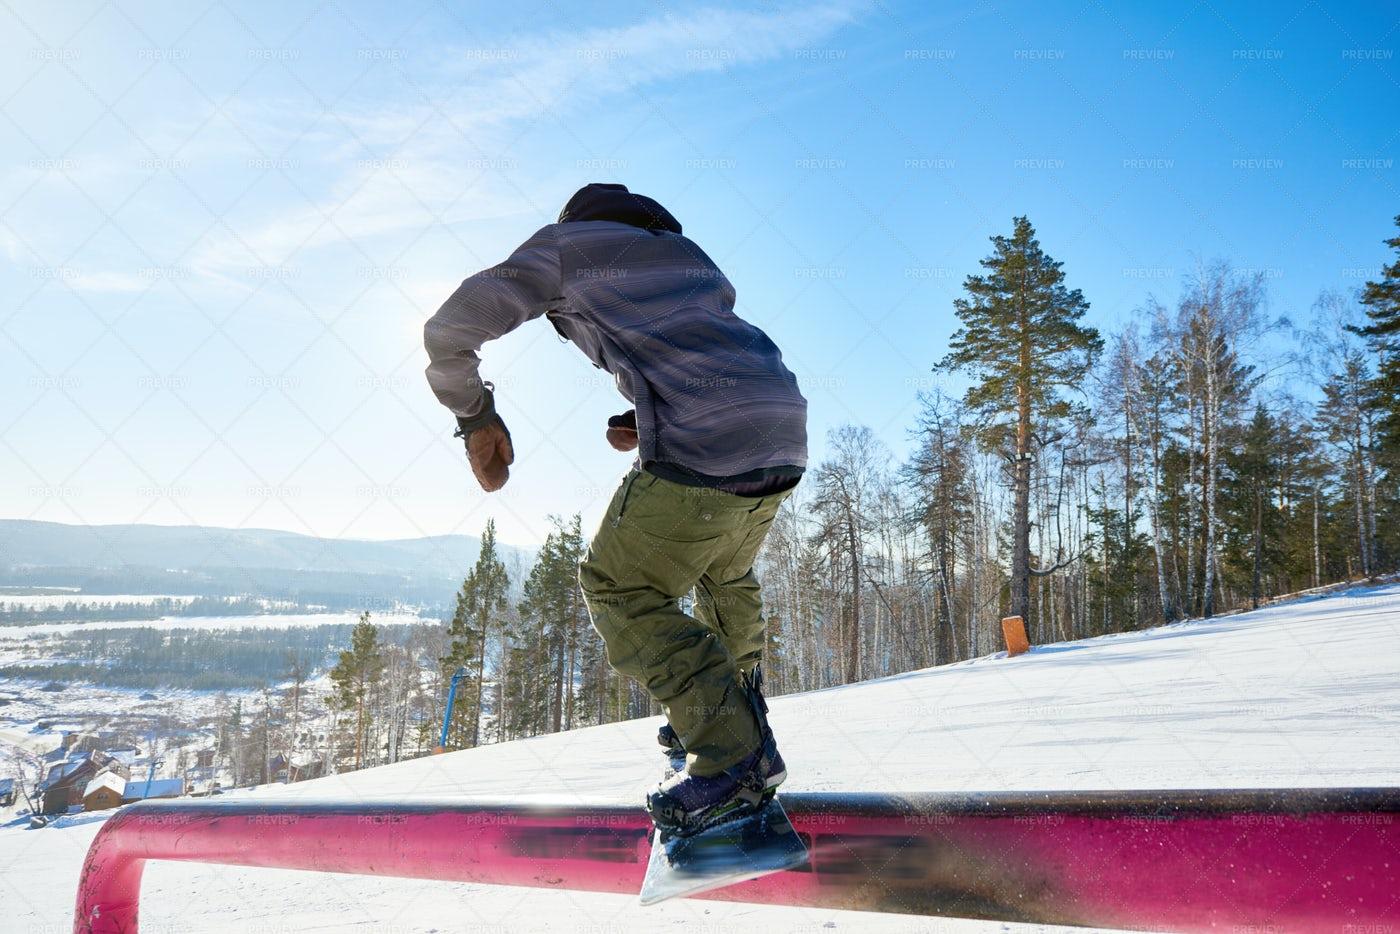 Snowboarder Riding On Rail: Stock Photos